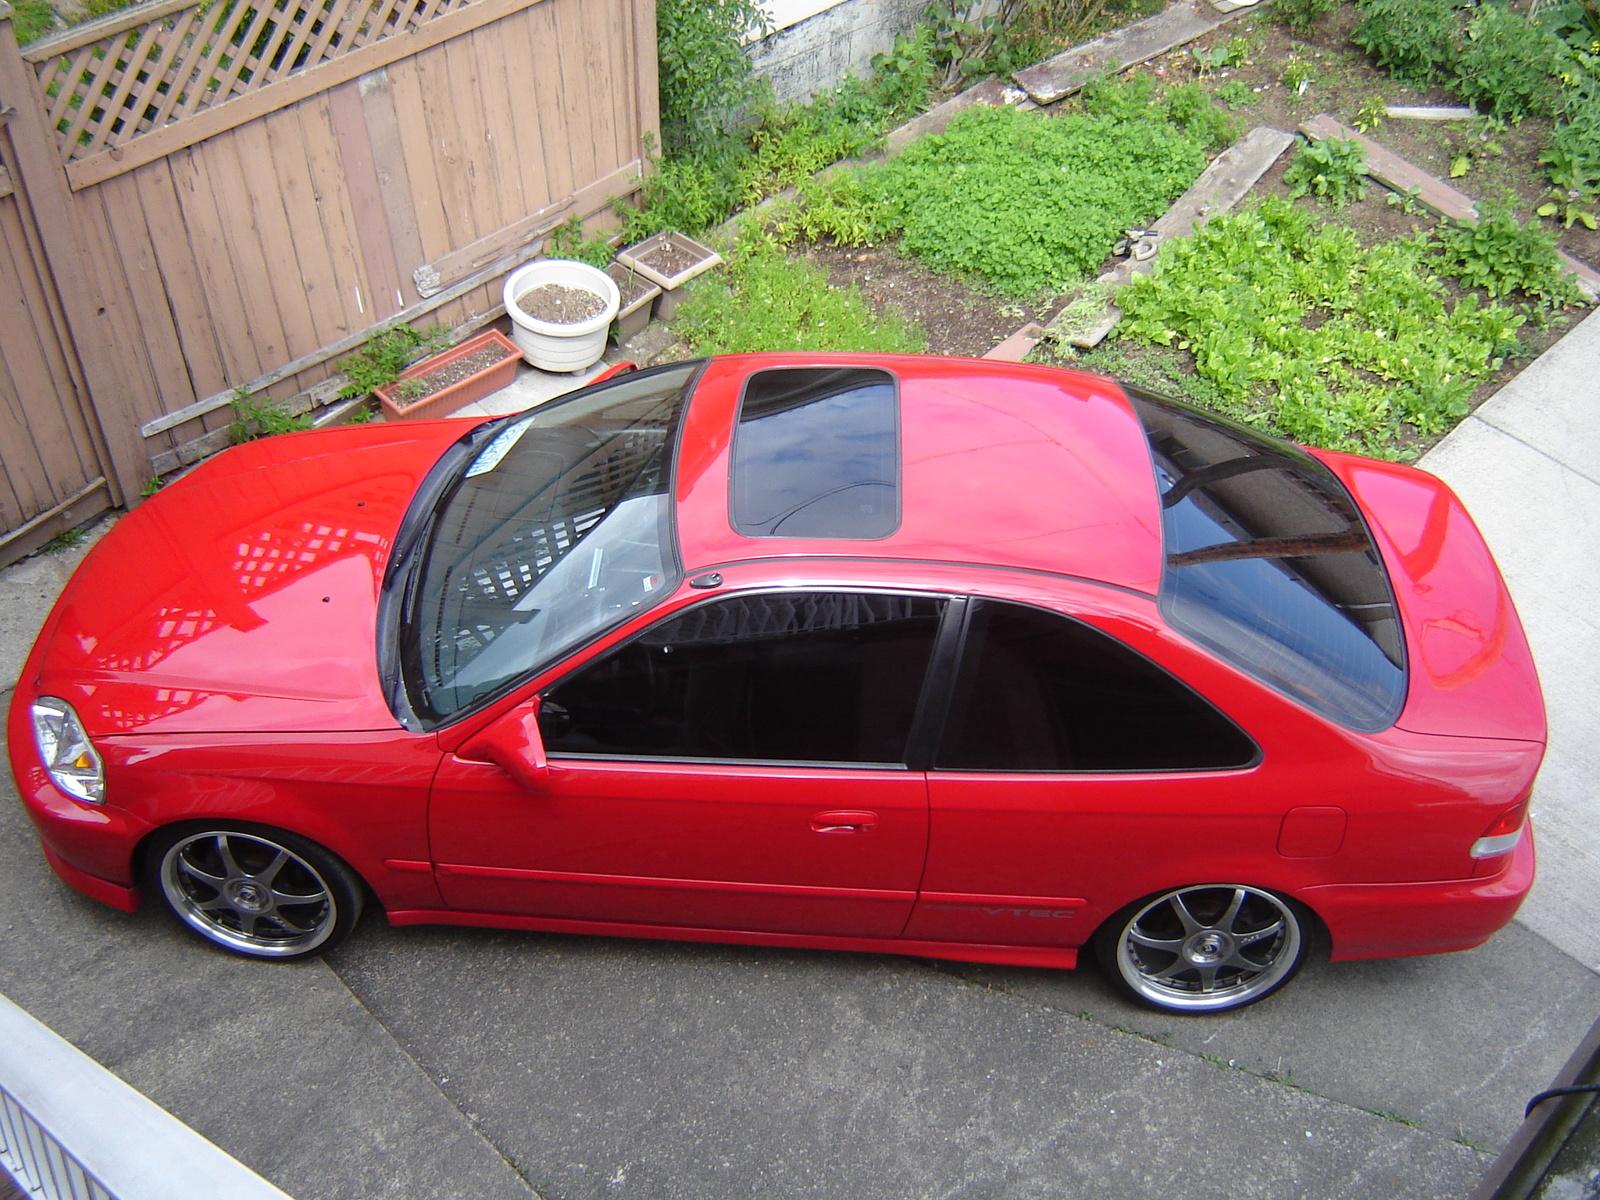 Honda Civic Si Hatchback 2000 Del Sol Fuse Box 1993 Diagram Free Engine